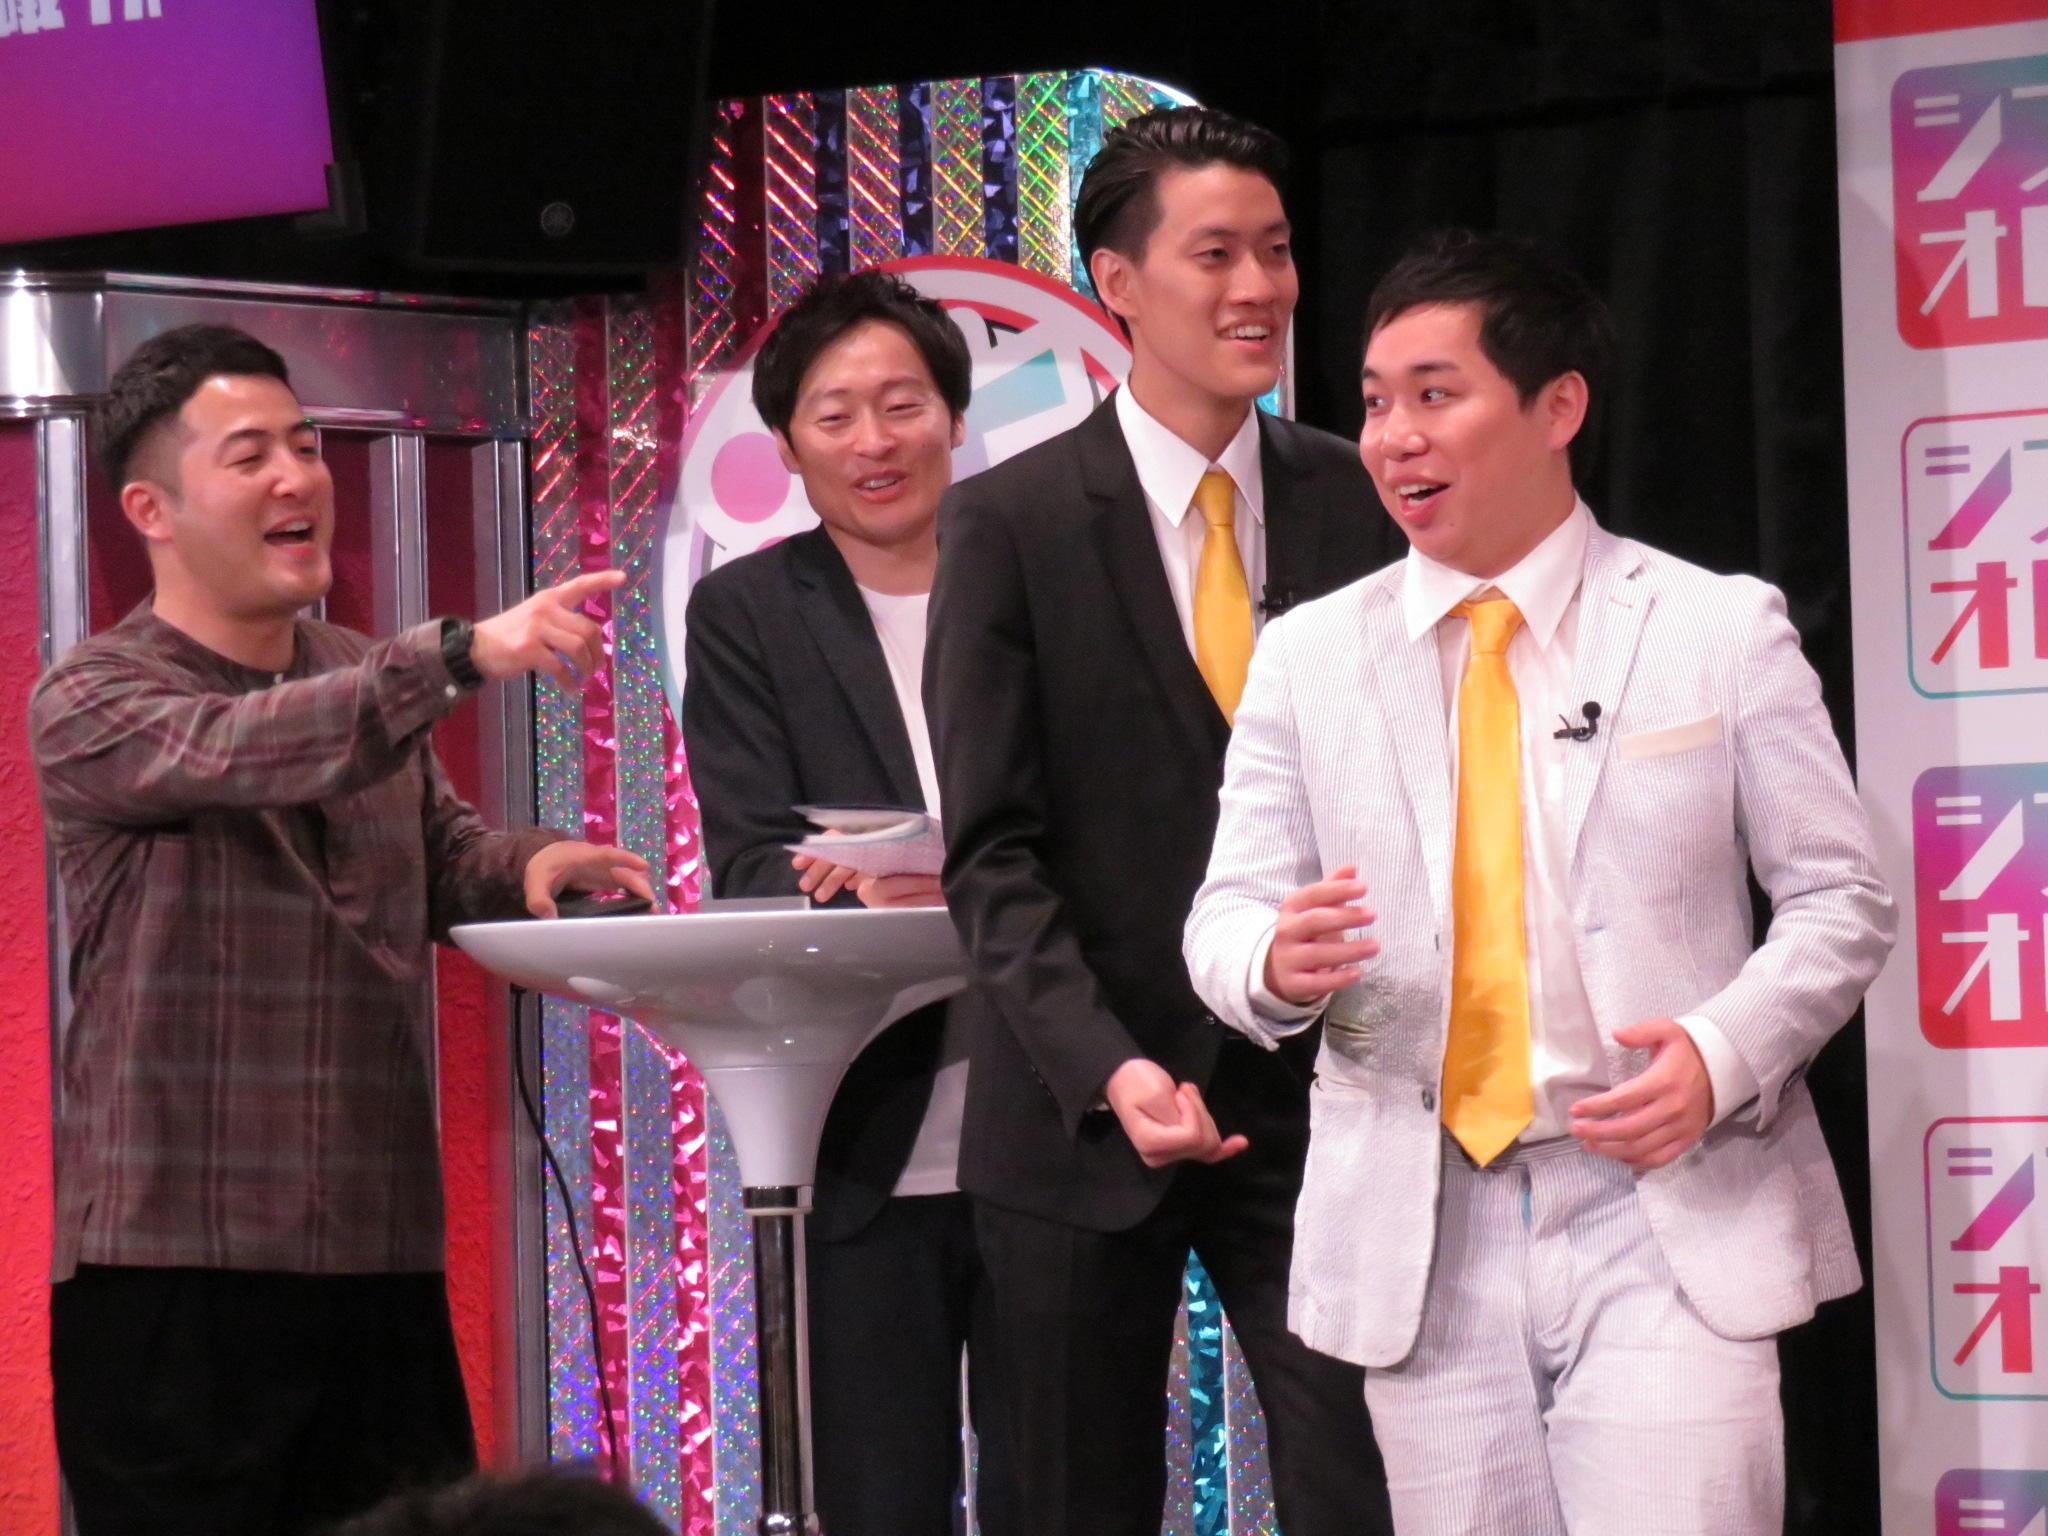 http://news.yoshimoto.co.jp/20181203202651-67d3a89ff30e167681d32119968d882f23043a96.jpg